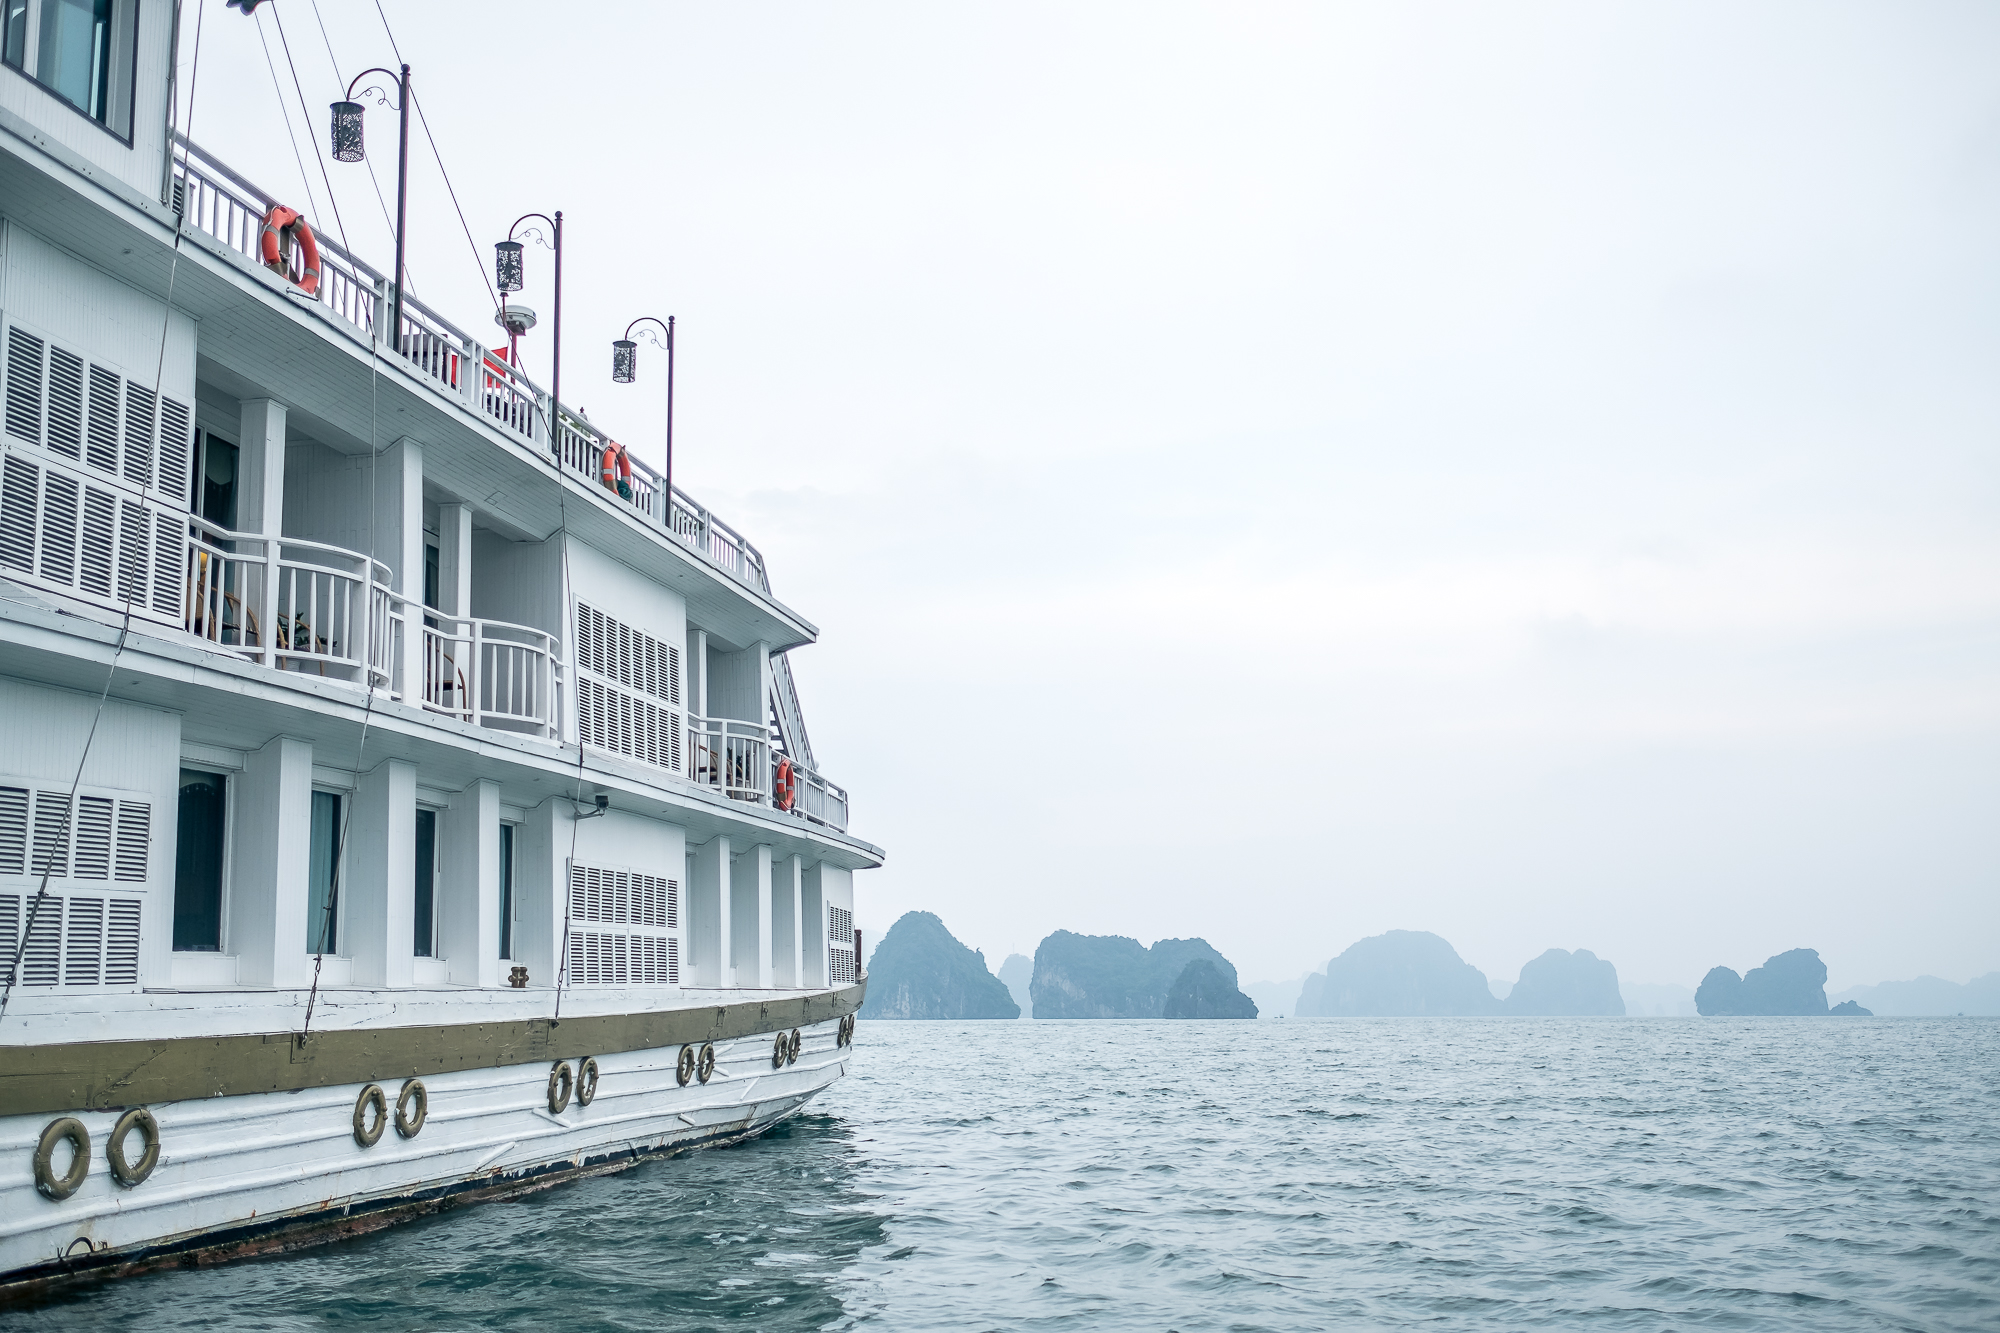 Vietnam_Honeymoon_TheOutsiderBlog_DSCF8499.JPG